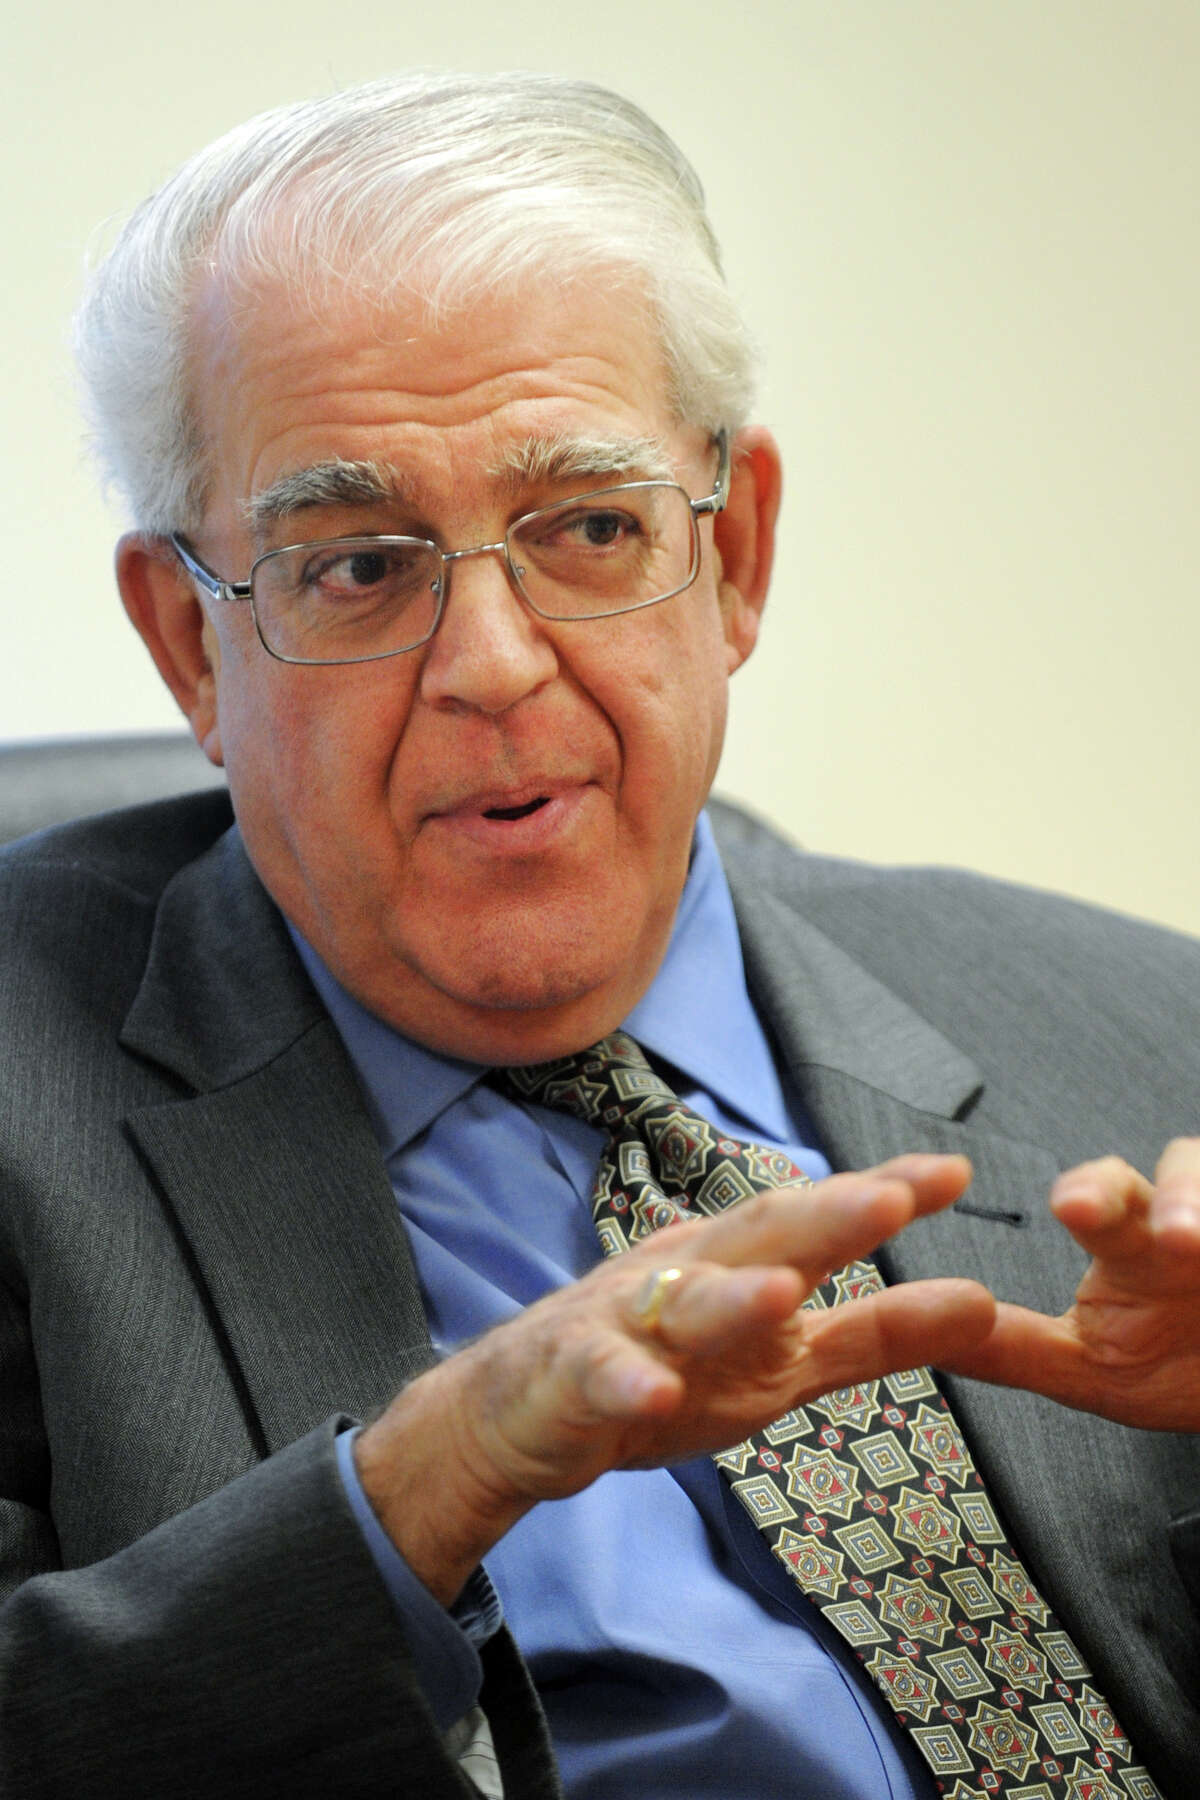 Paul Timpanelli, President & CEO Bridgeport Regional Business Council